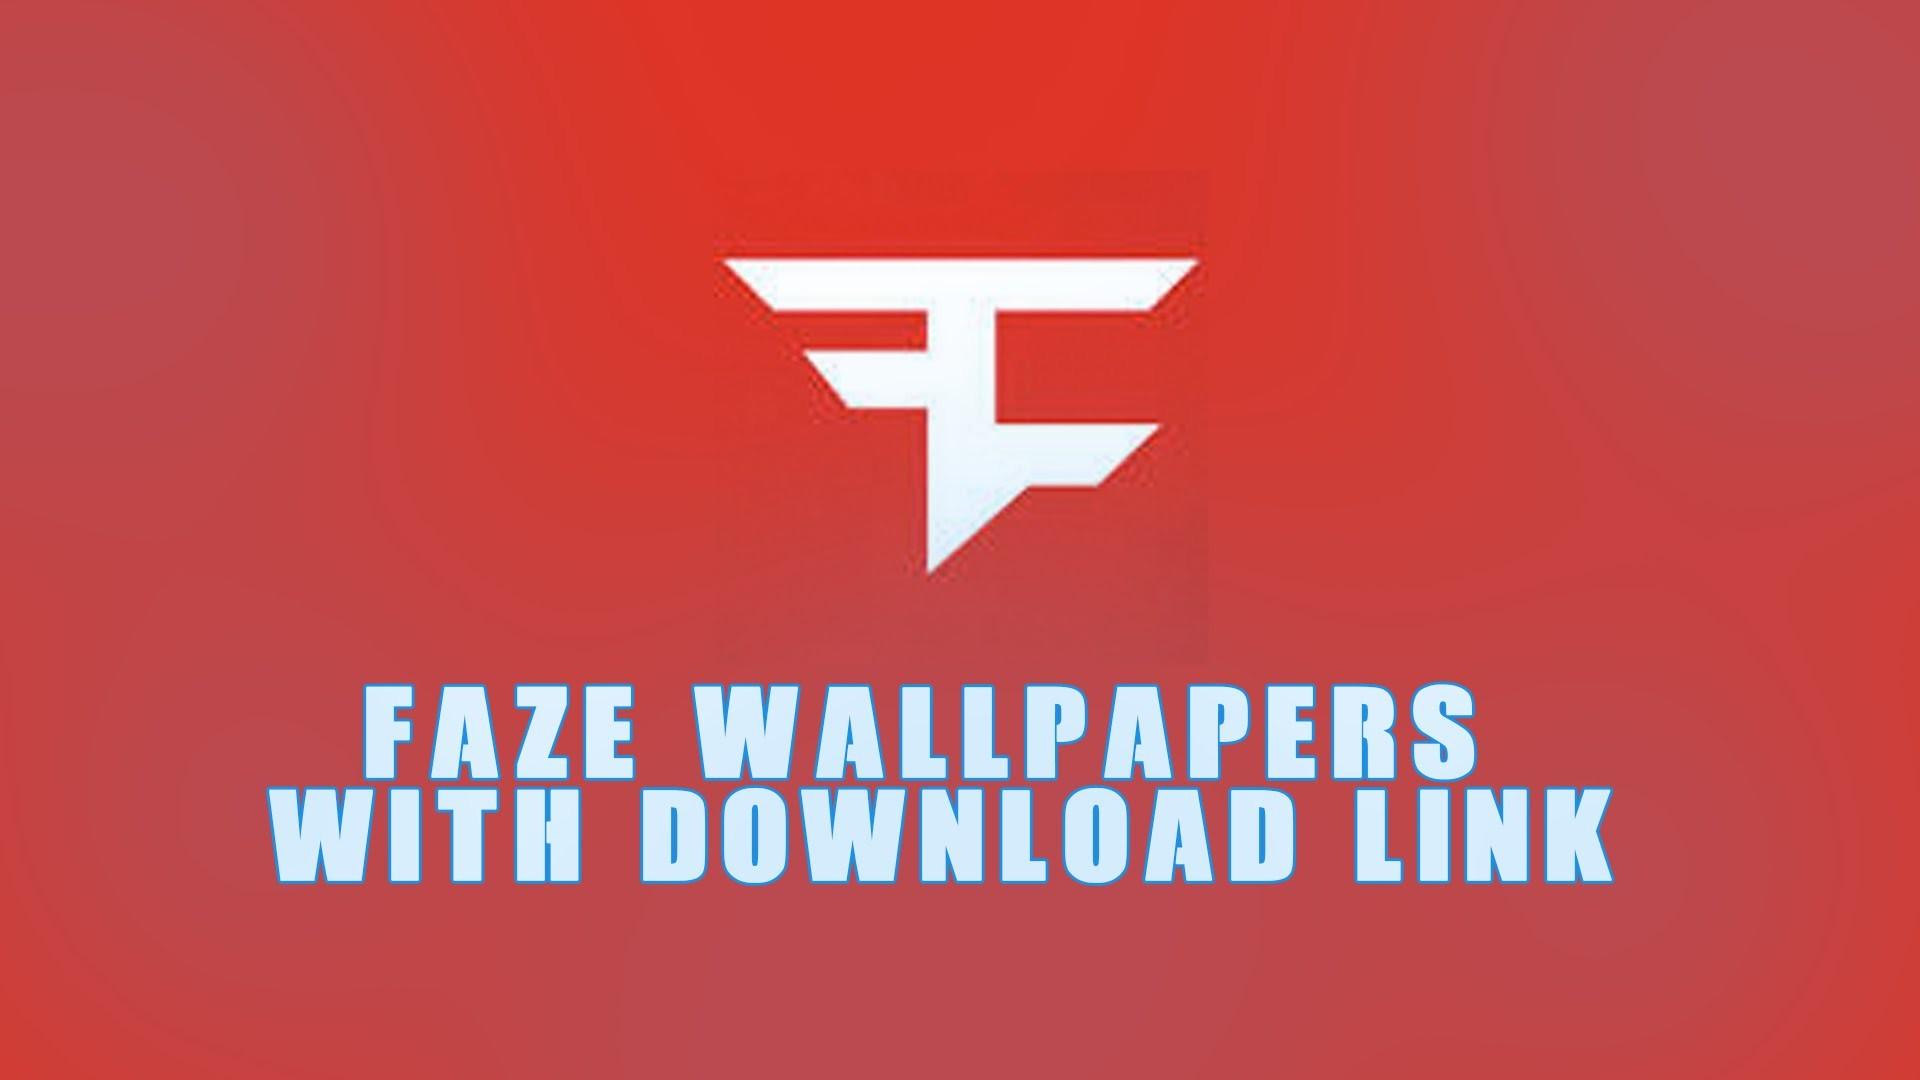 faze logo wallpaper iphone. 1920x1080 faze logo wallpaper iphone background progression t